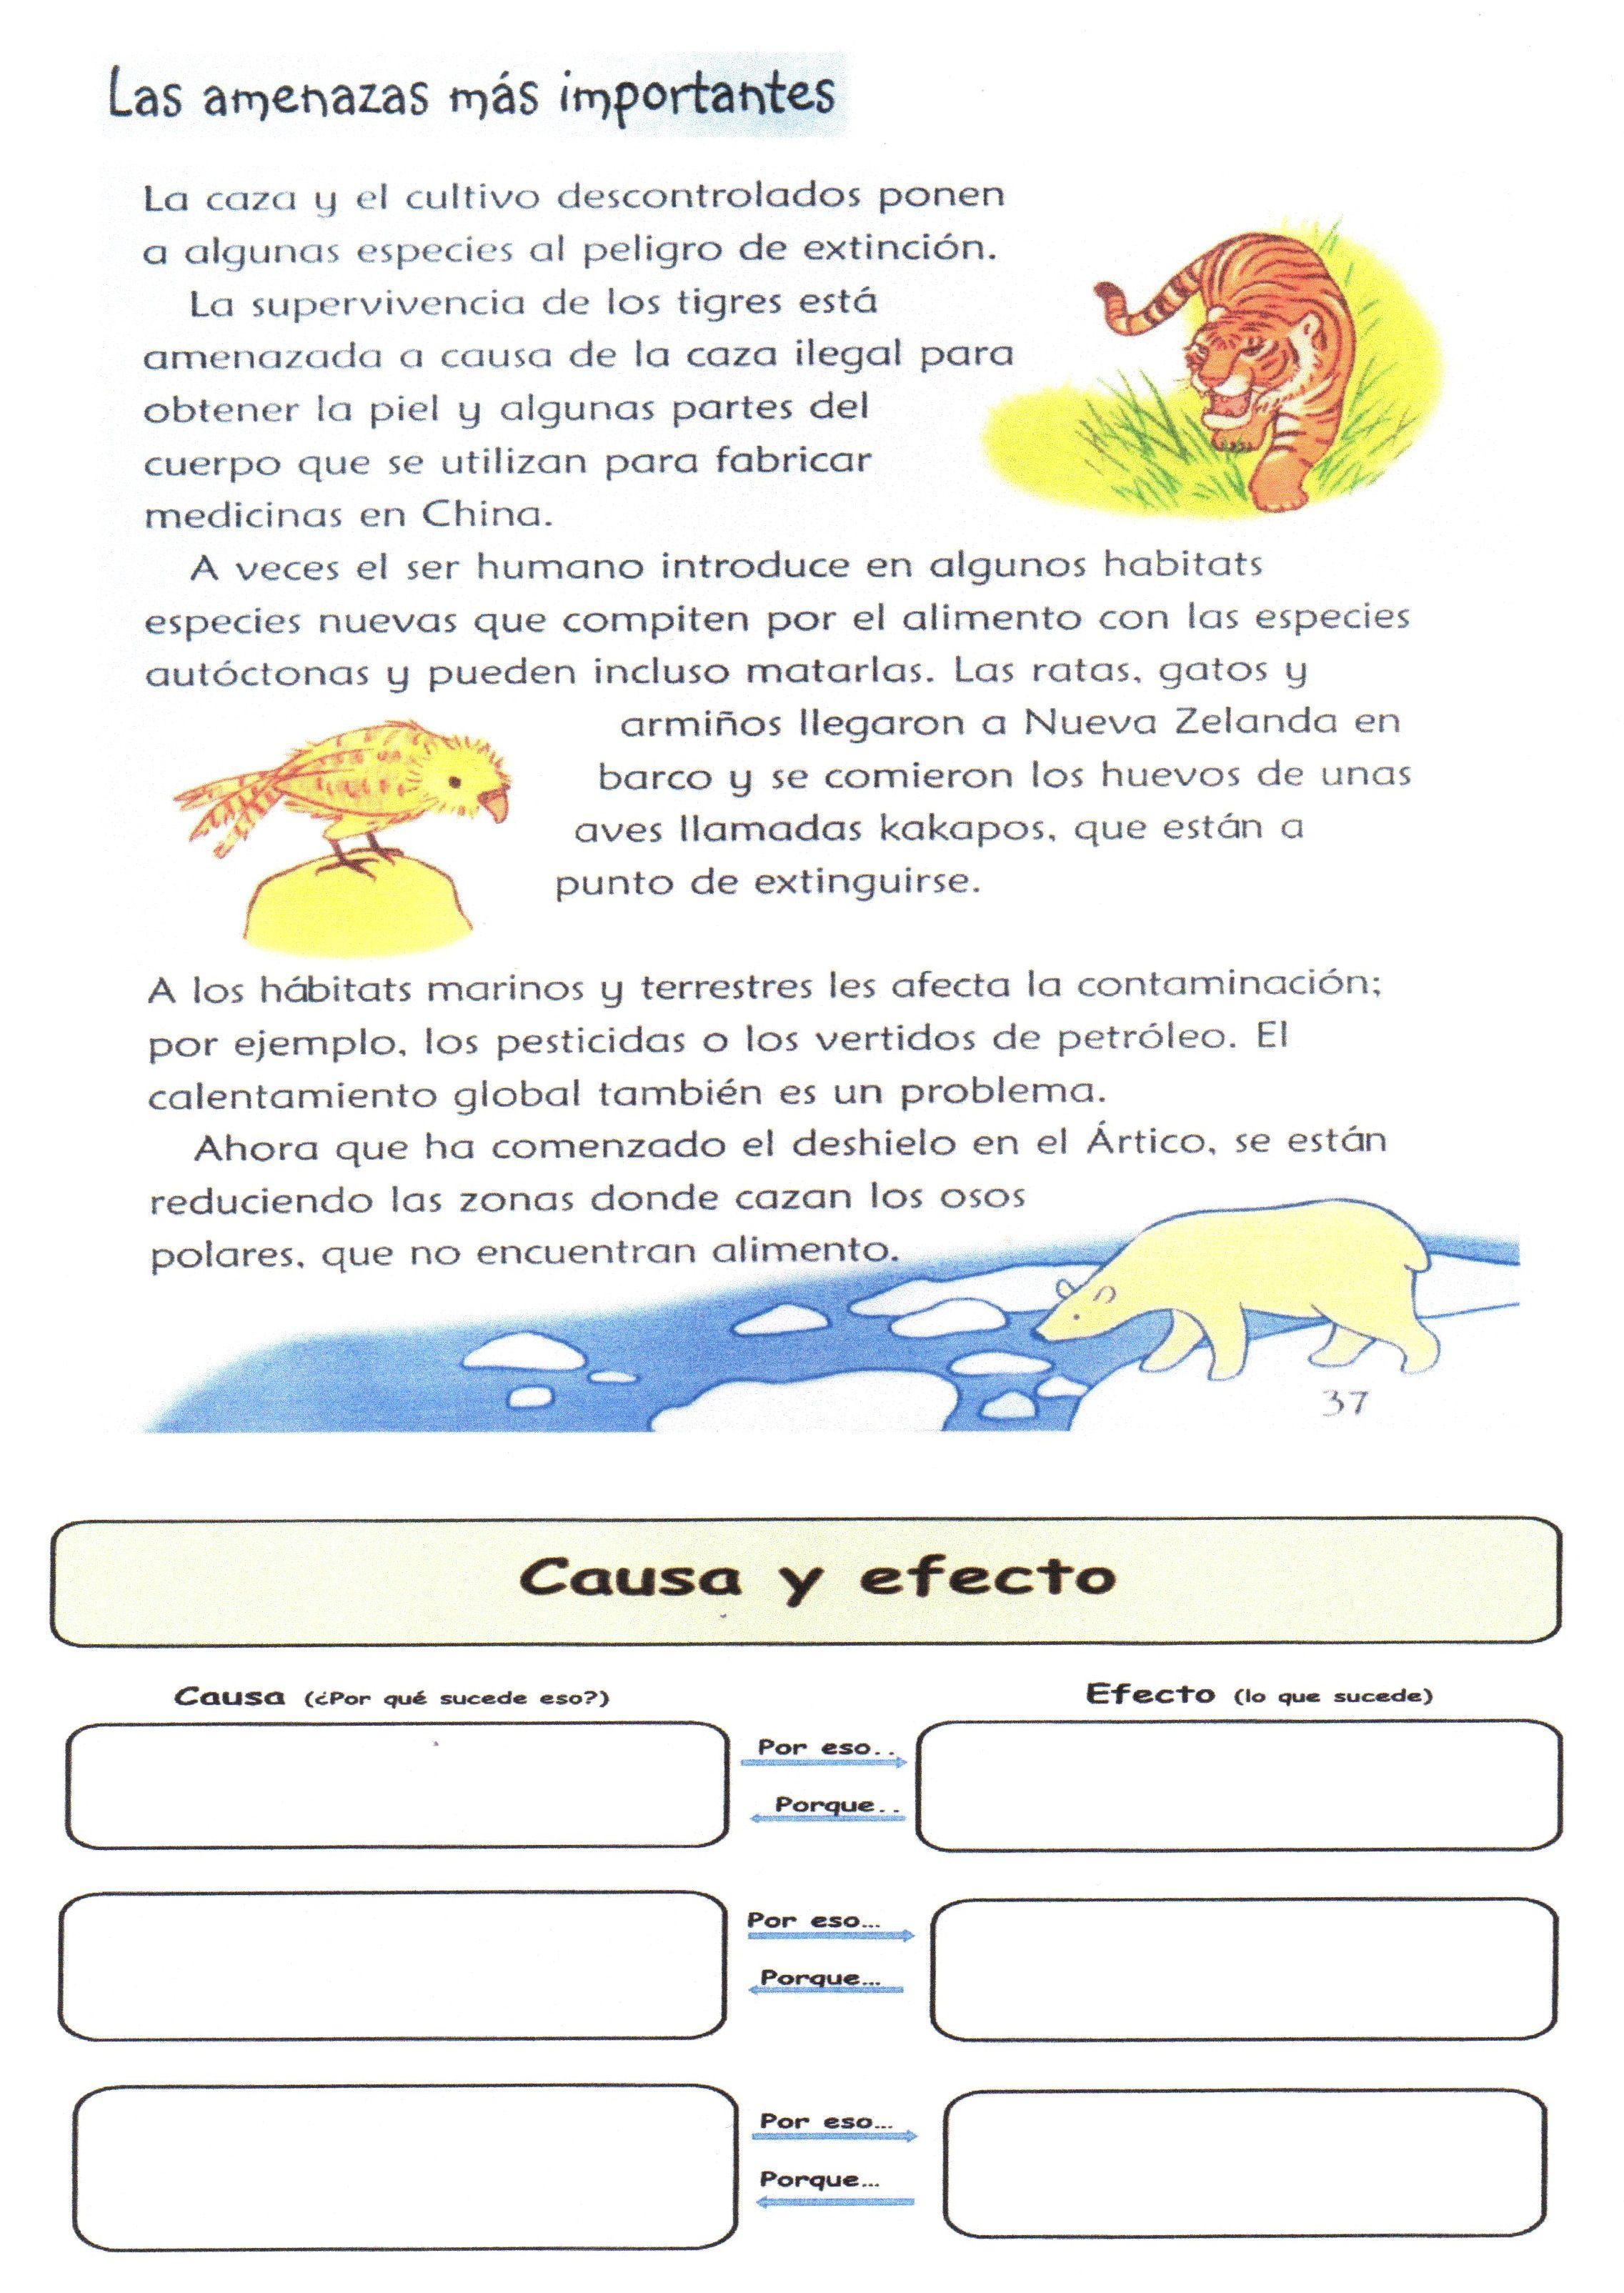 Enllac Amb Molta Informacio Lectura Ceip Santa Barbara Matarrosa Leon Texto Y Organizador